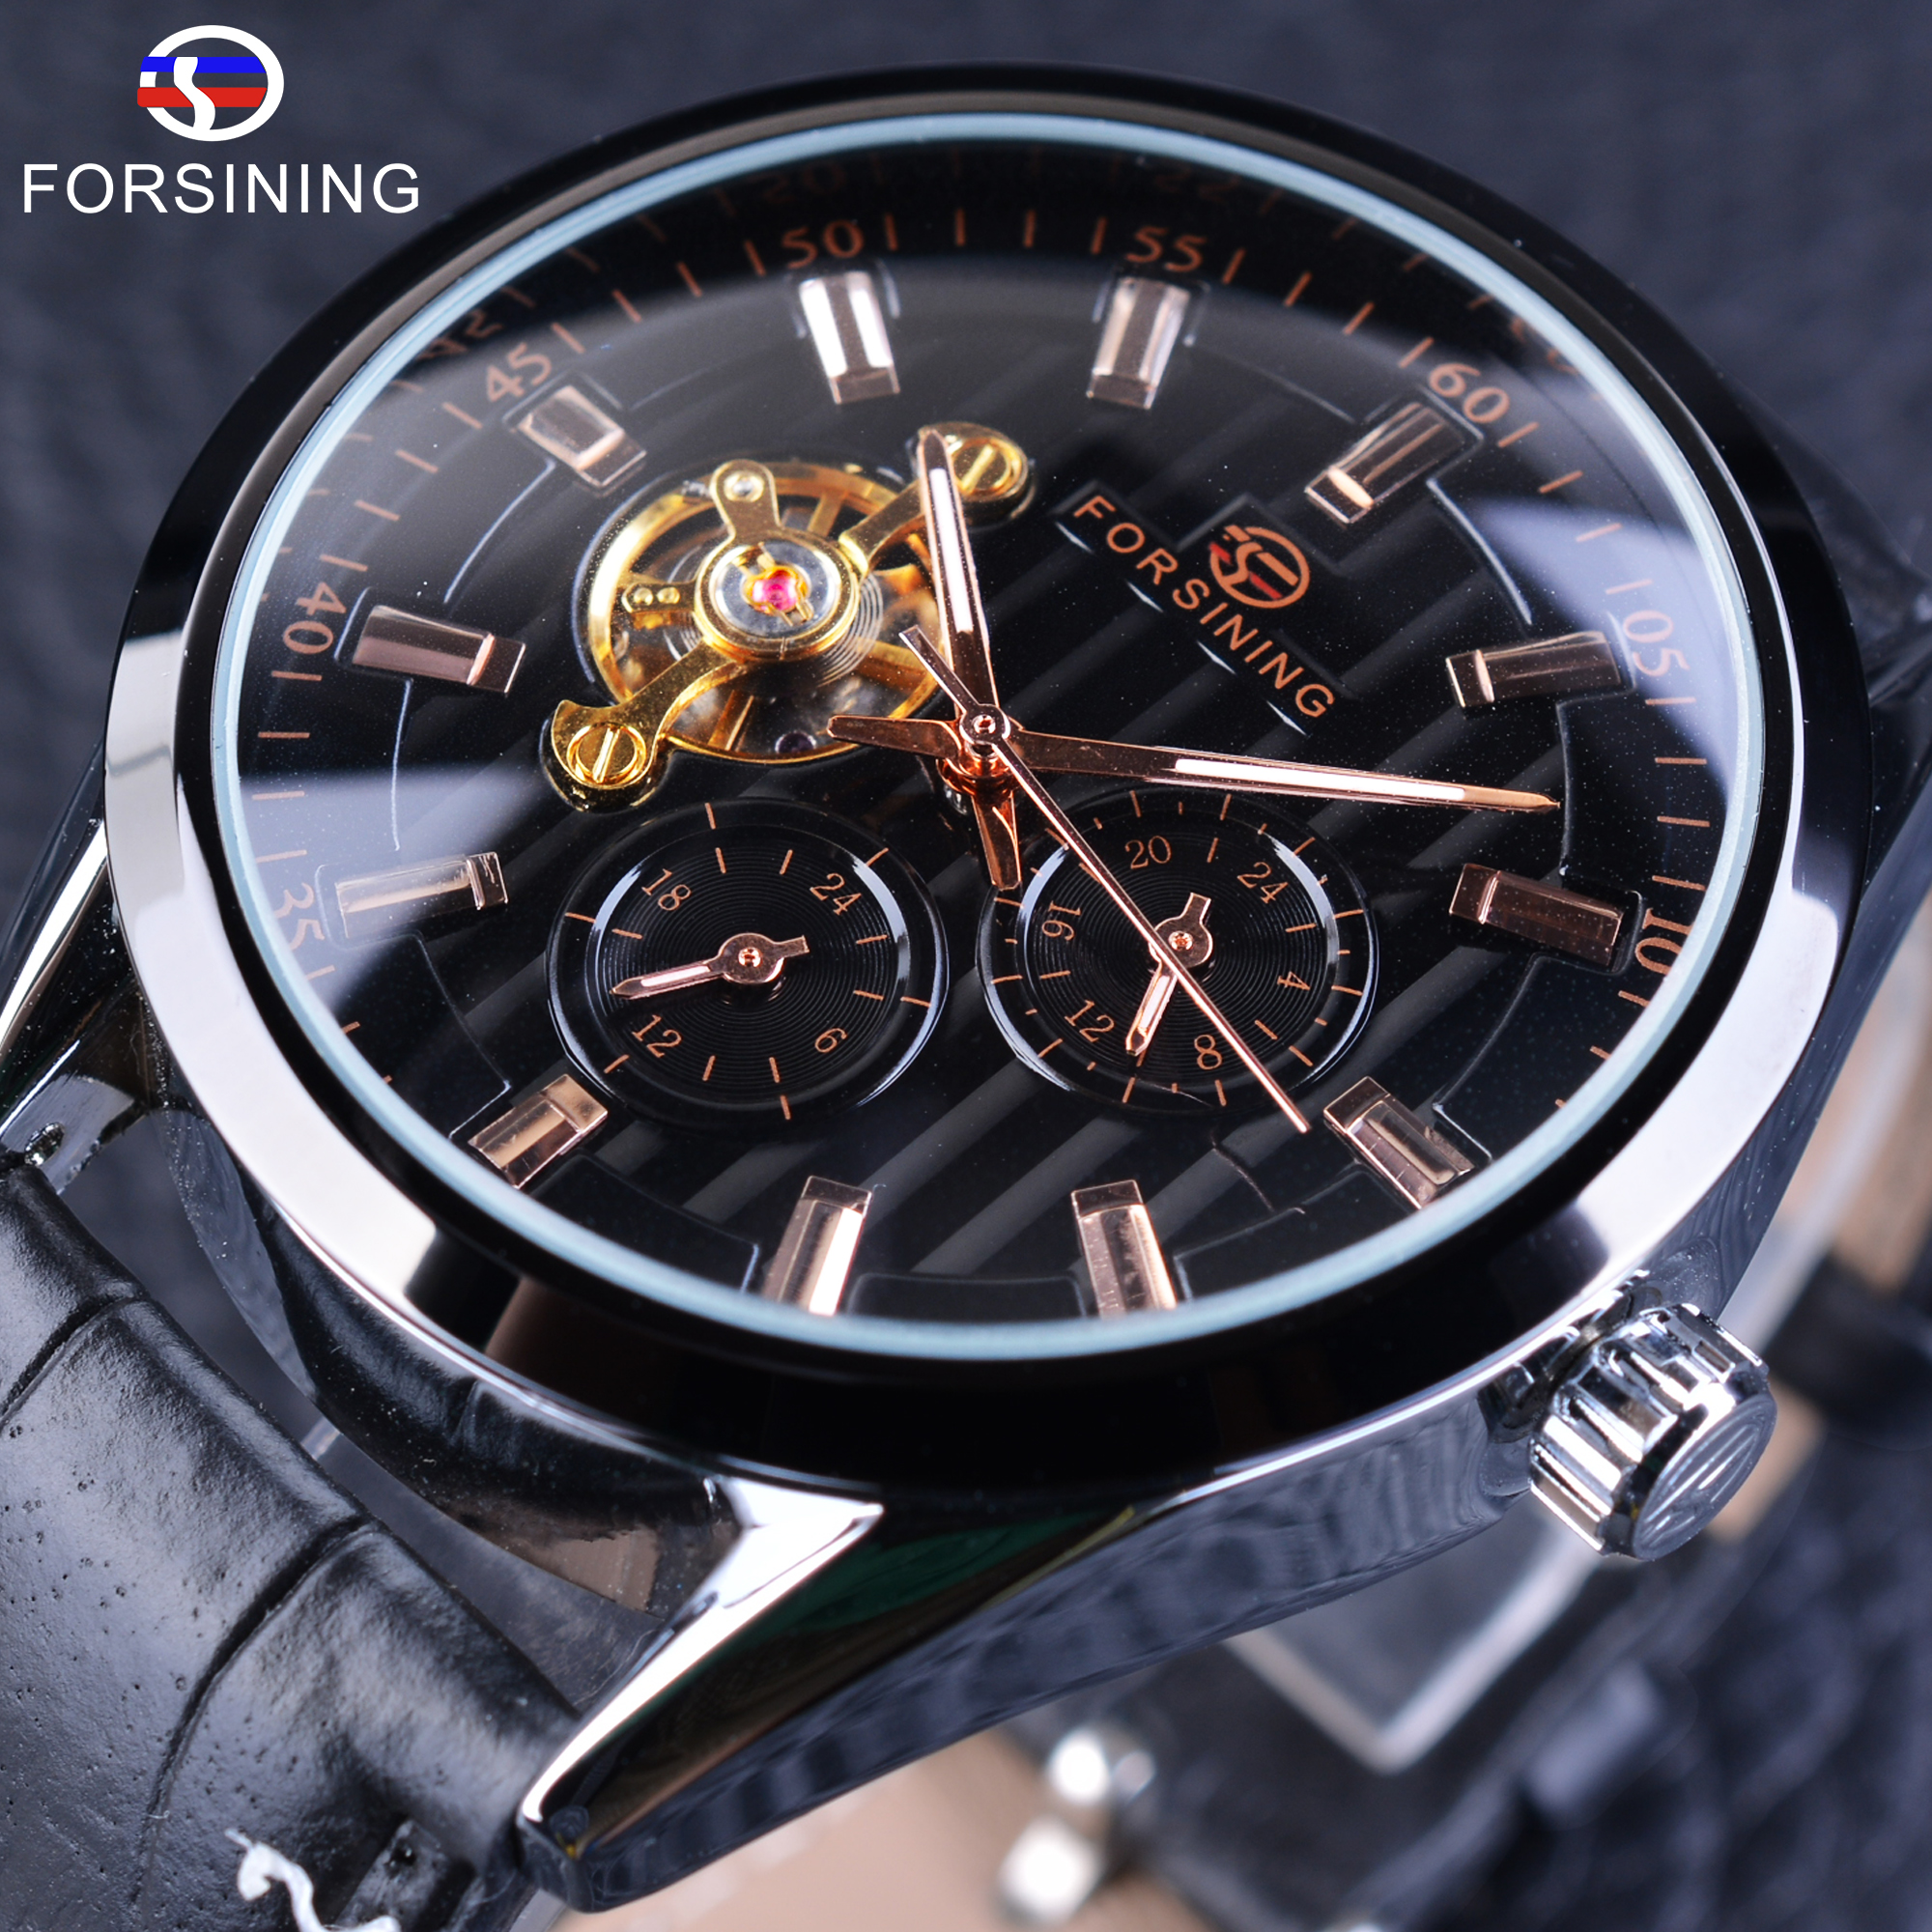 Forsining Mens Watch Fashion Tourbillion Design Hour Display Automatic Man Clock Black Genuine Leather Strap Wrist Watch<br>